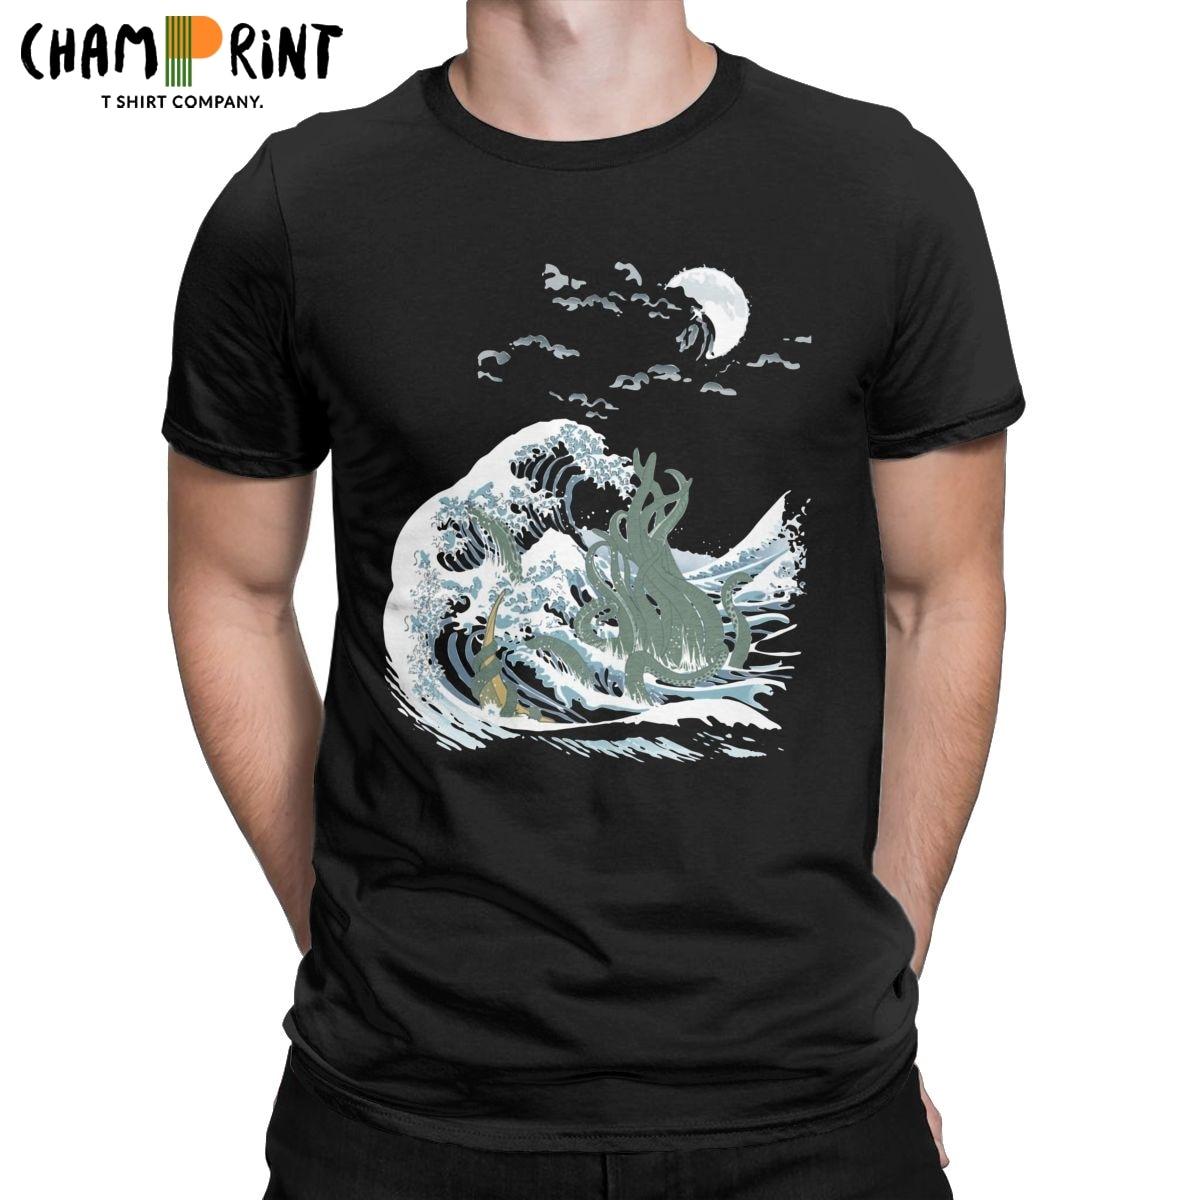 Camisetas de manga corta para hombre, camisa informal de algodón, Kanagawa, Call...